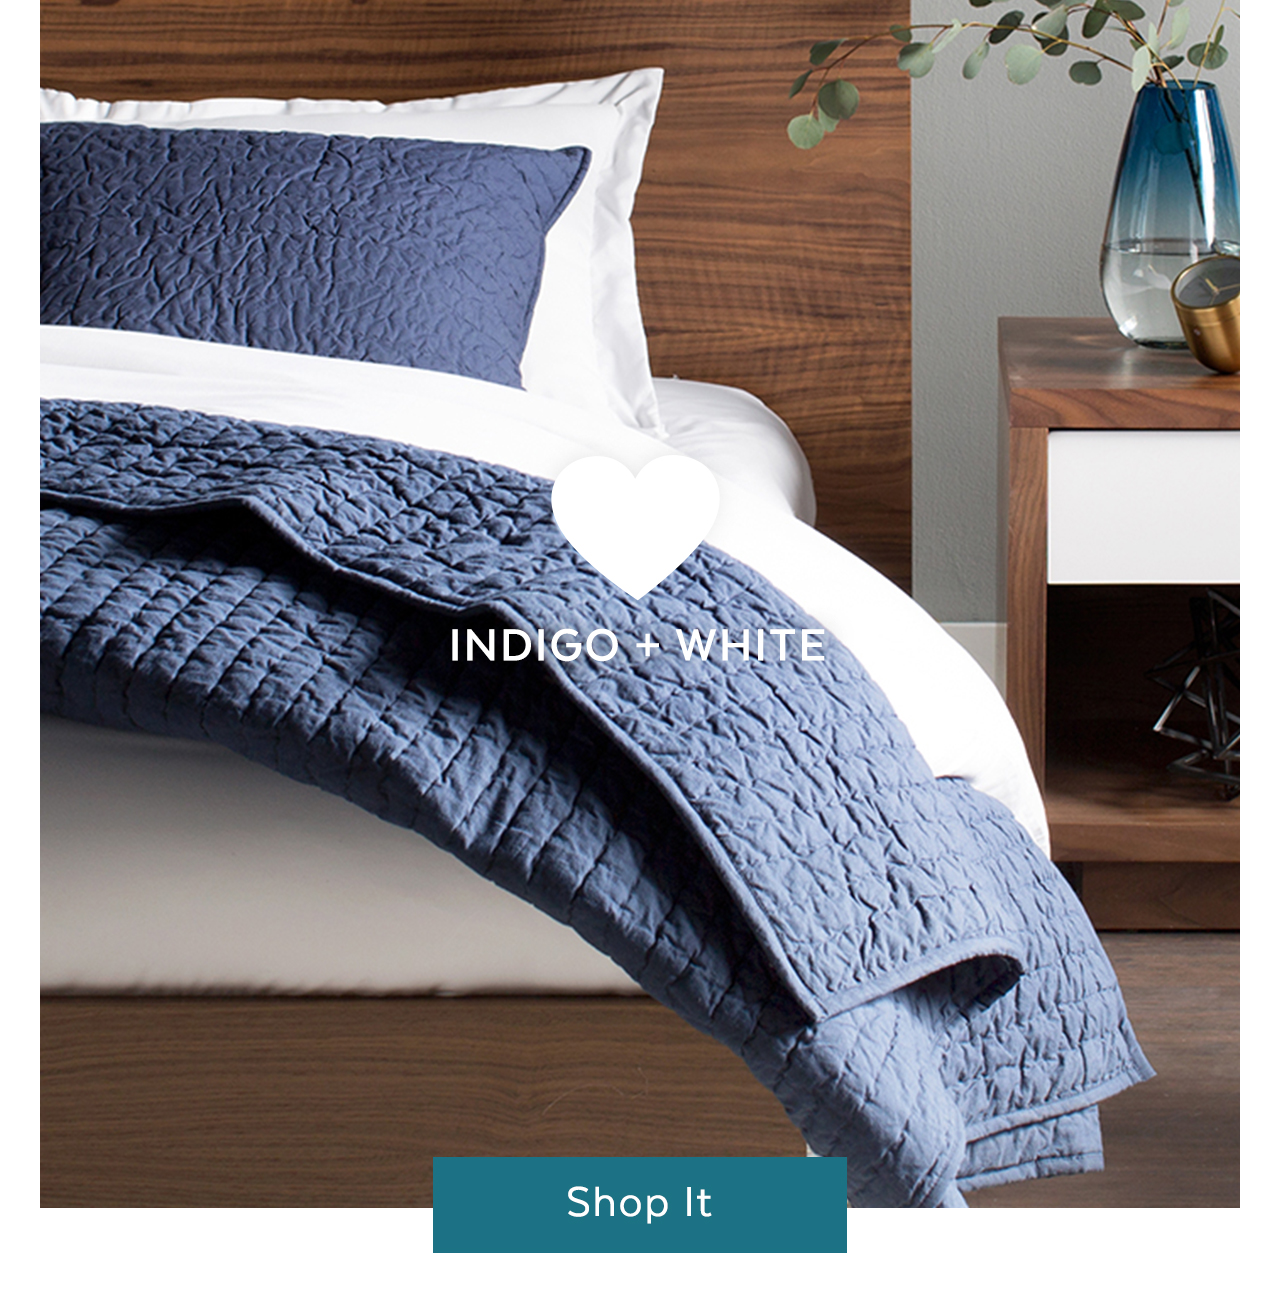 indigo and white